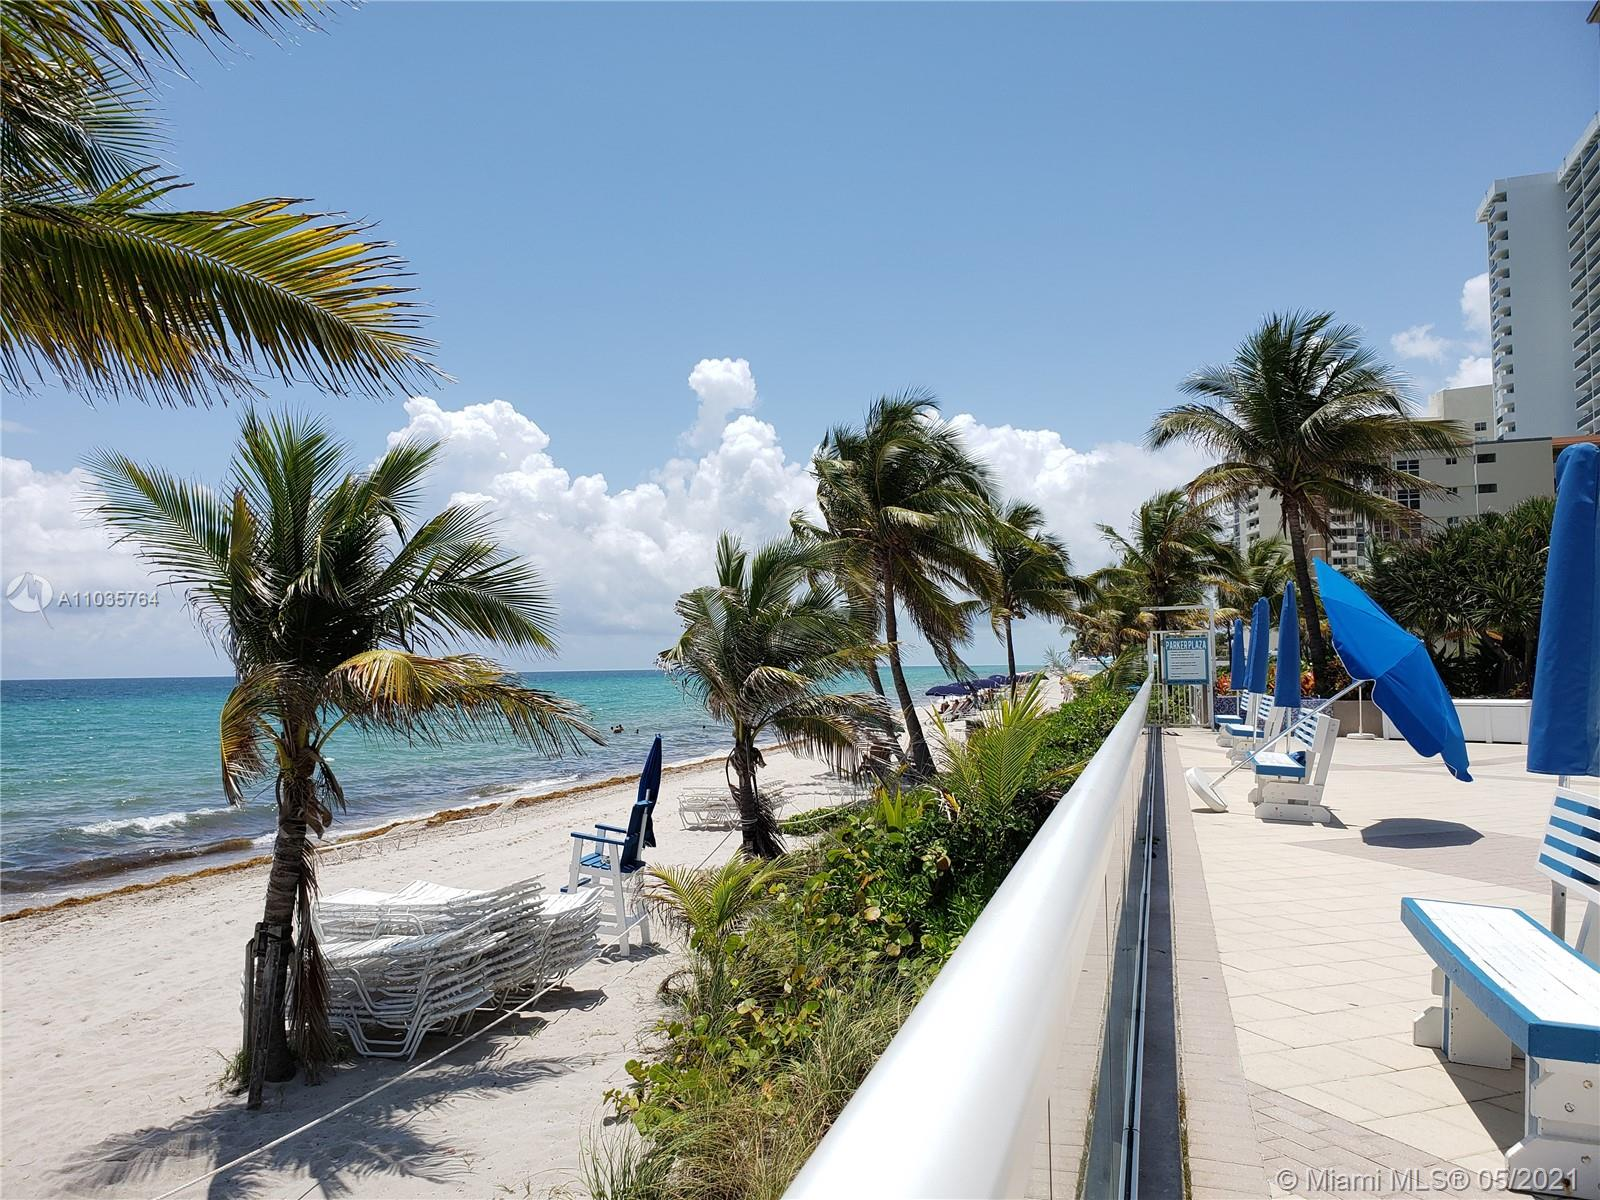 Photo of 2030 Ocean Dr #1804, Hallandale Beach, Florida, 33009 - Parker Plaza Beach Area